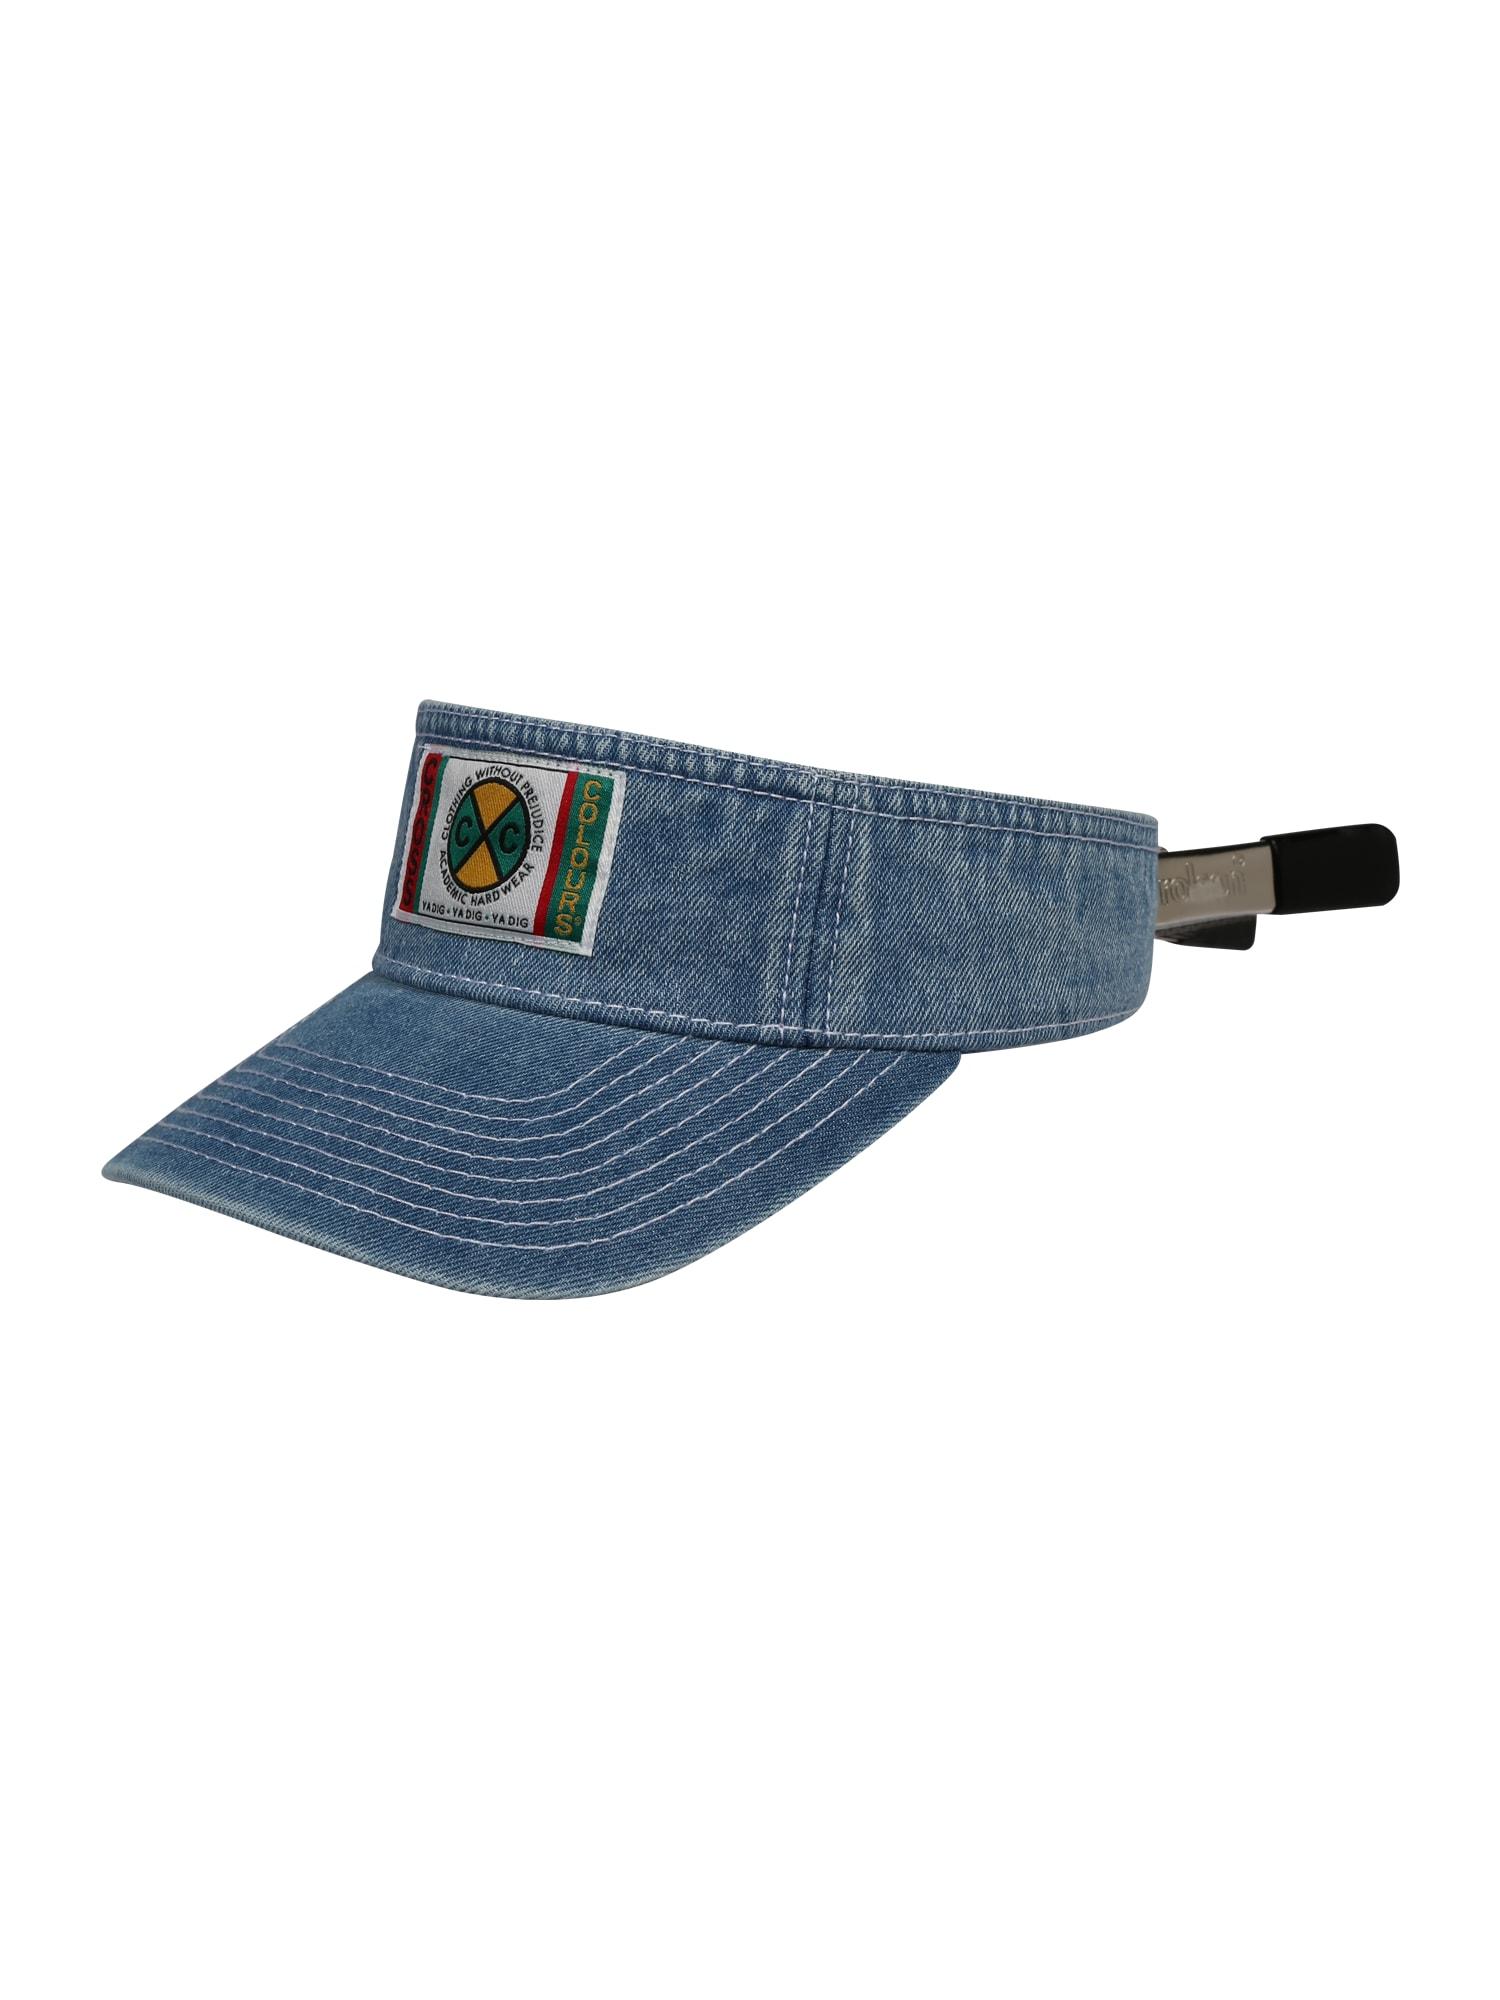 CROSS COLOURS Kepurė 'Vintage' tamsiai (džinso) mėlyna